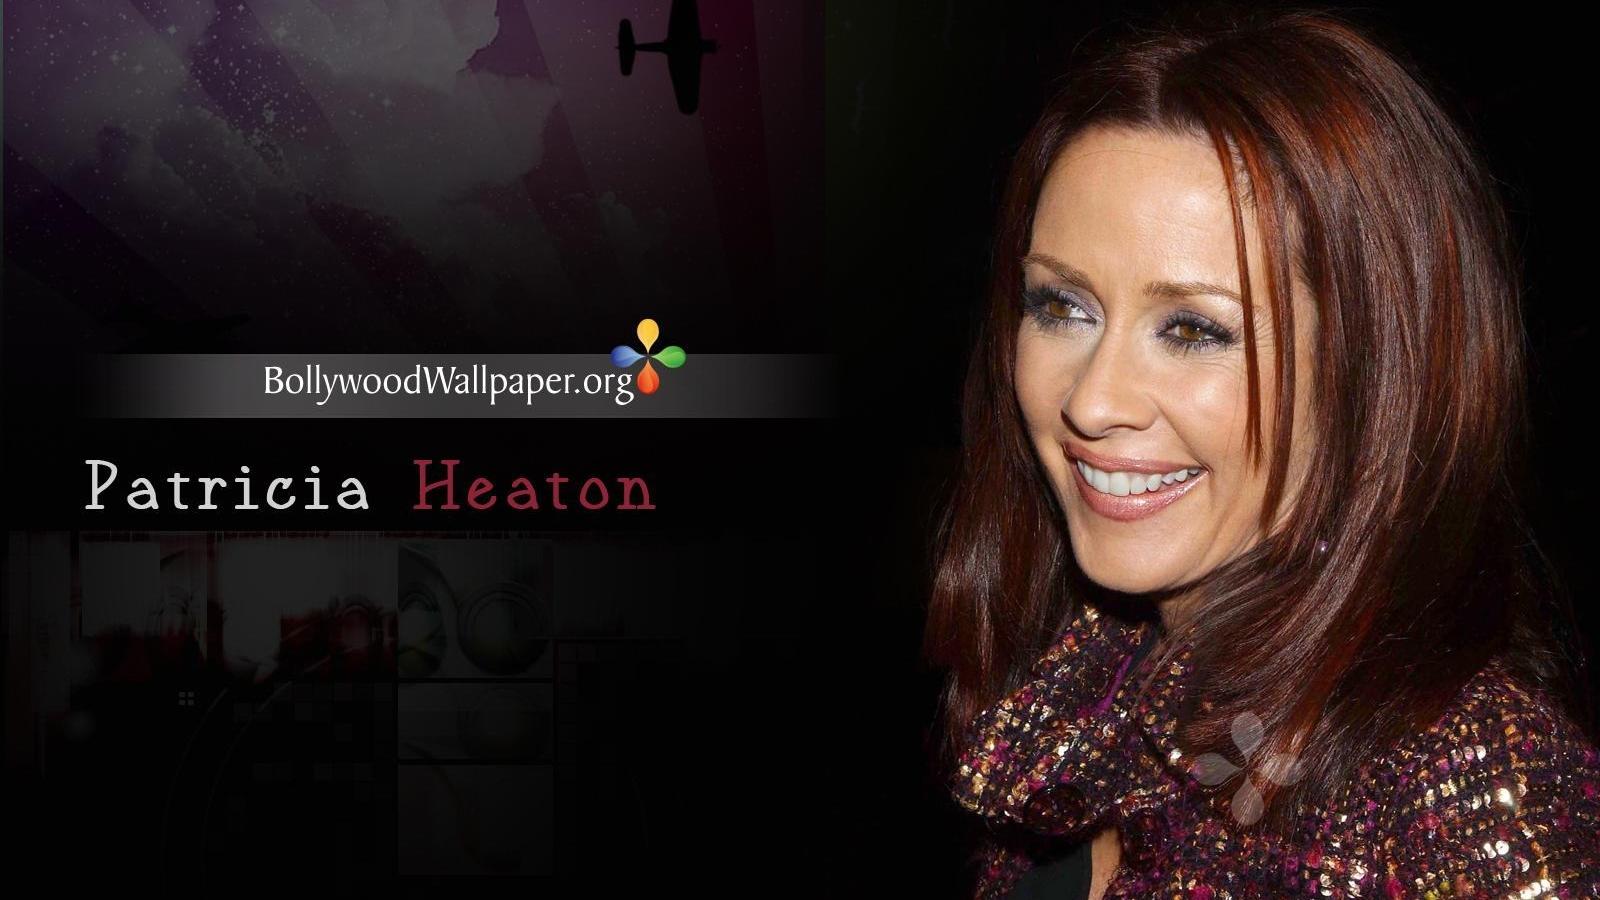 Patricia heaton ups — 8